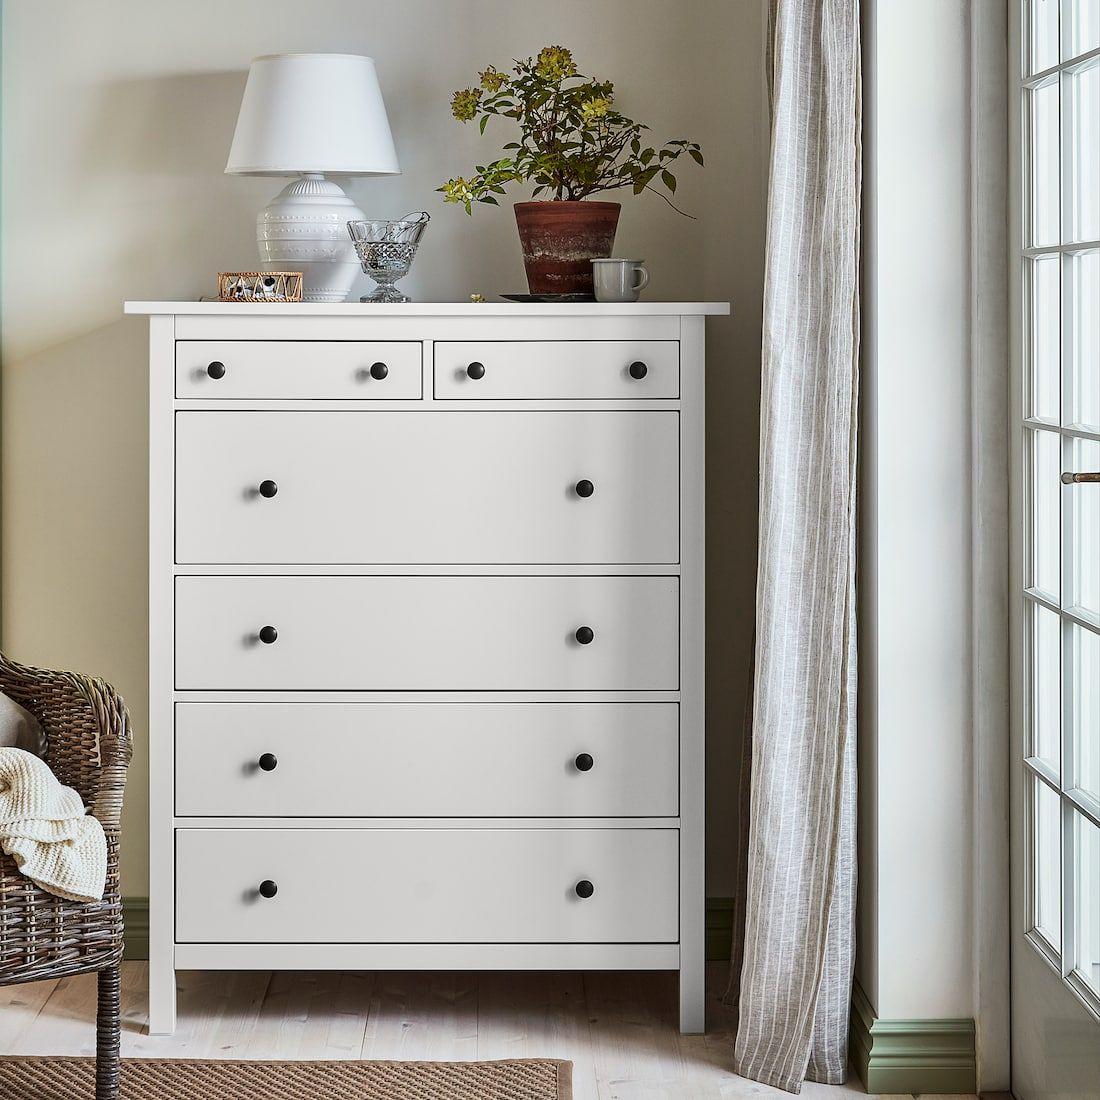 IKEA HEMNES White 6drawer chest Hemnes, Chest of